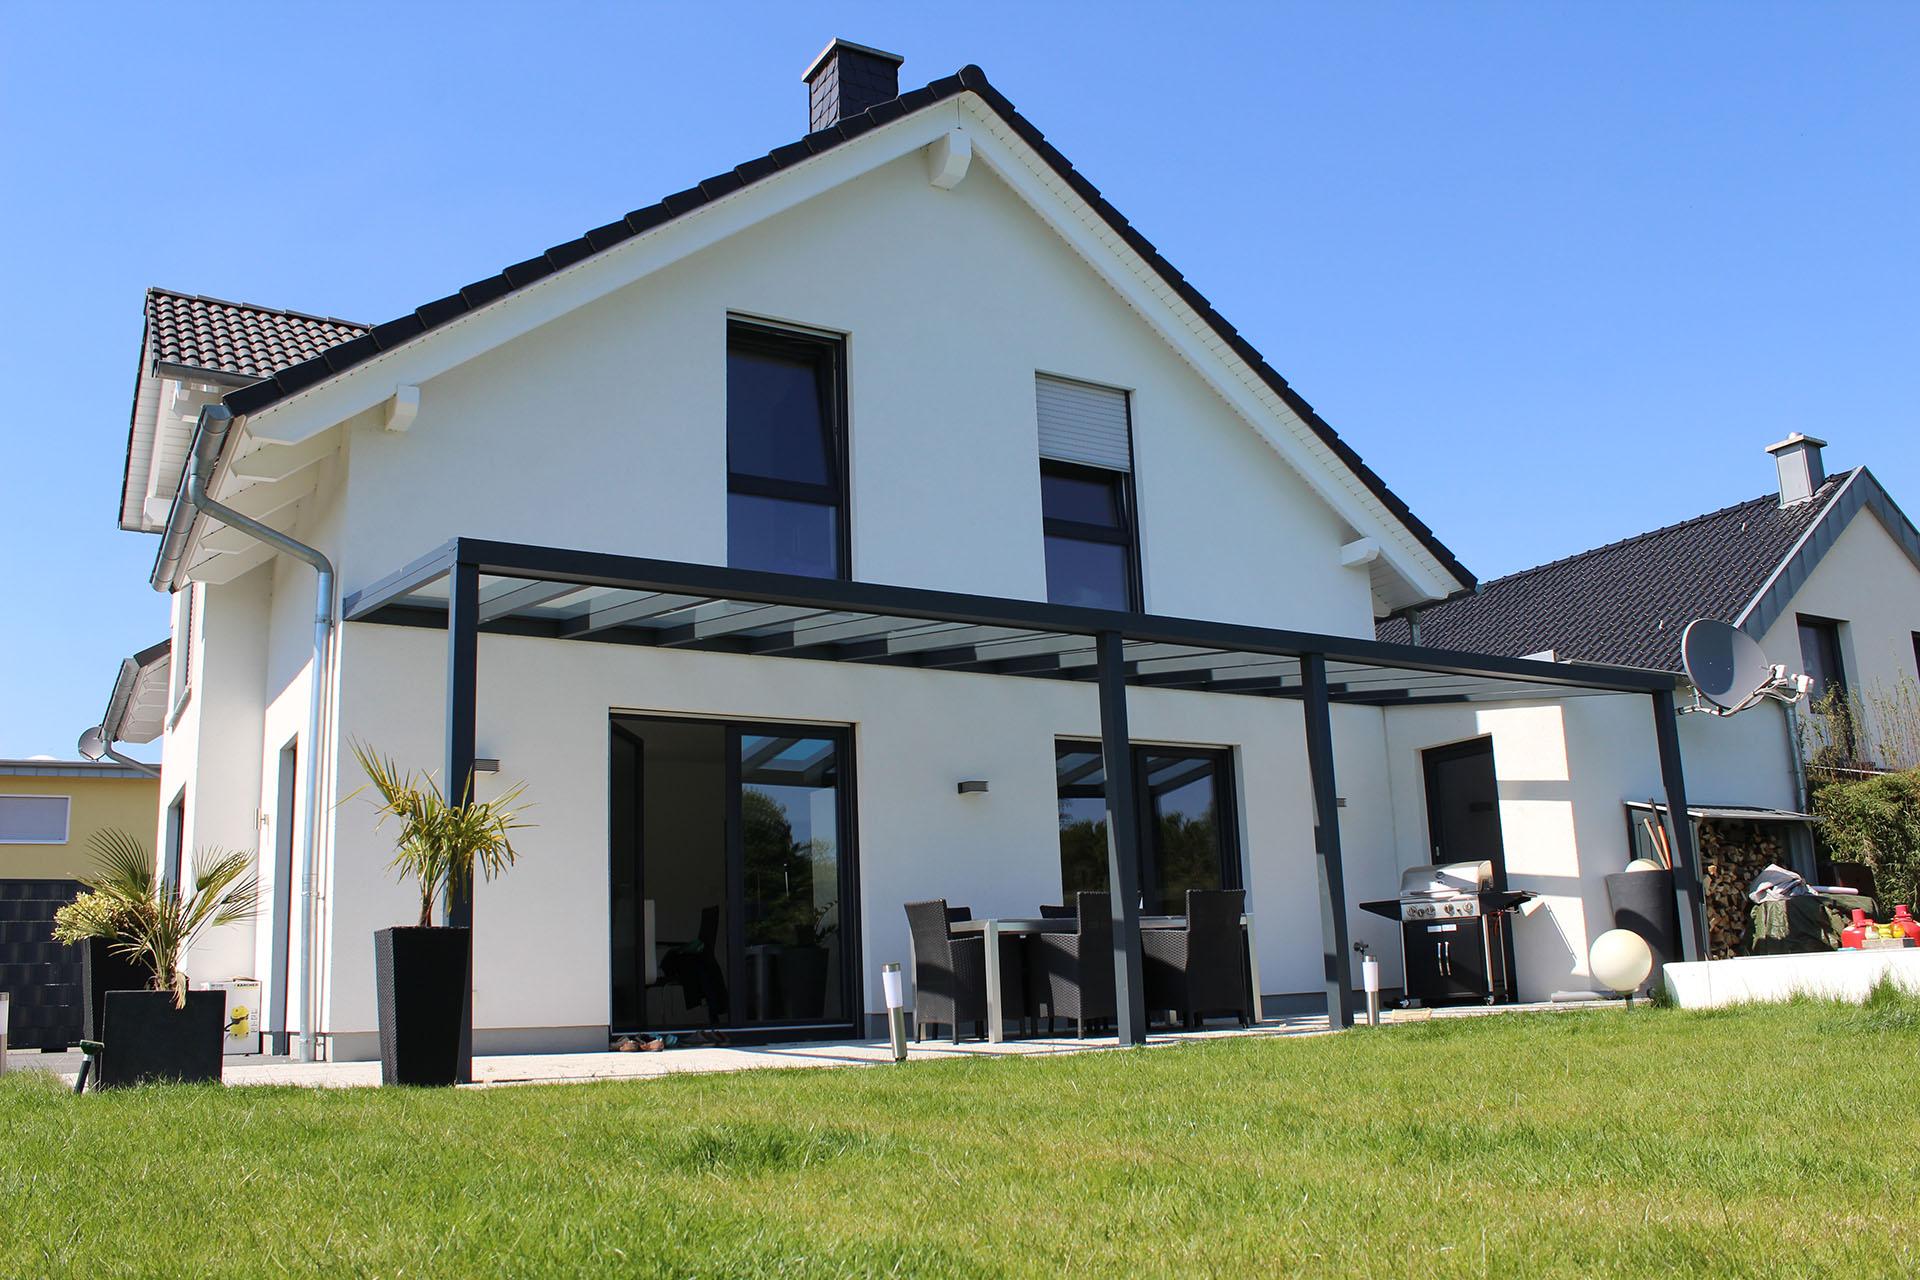 terrassenüberdachung alu 10mm sicherheitsglas vsg glas klar 5m, Hause deko